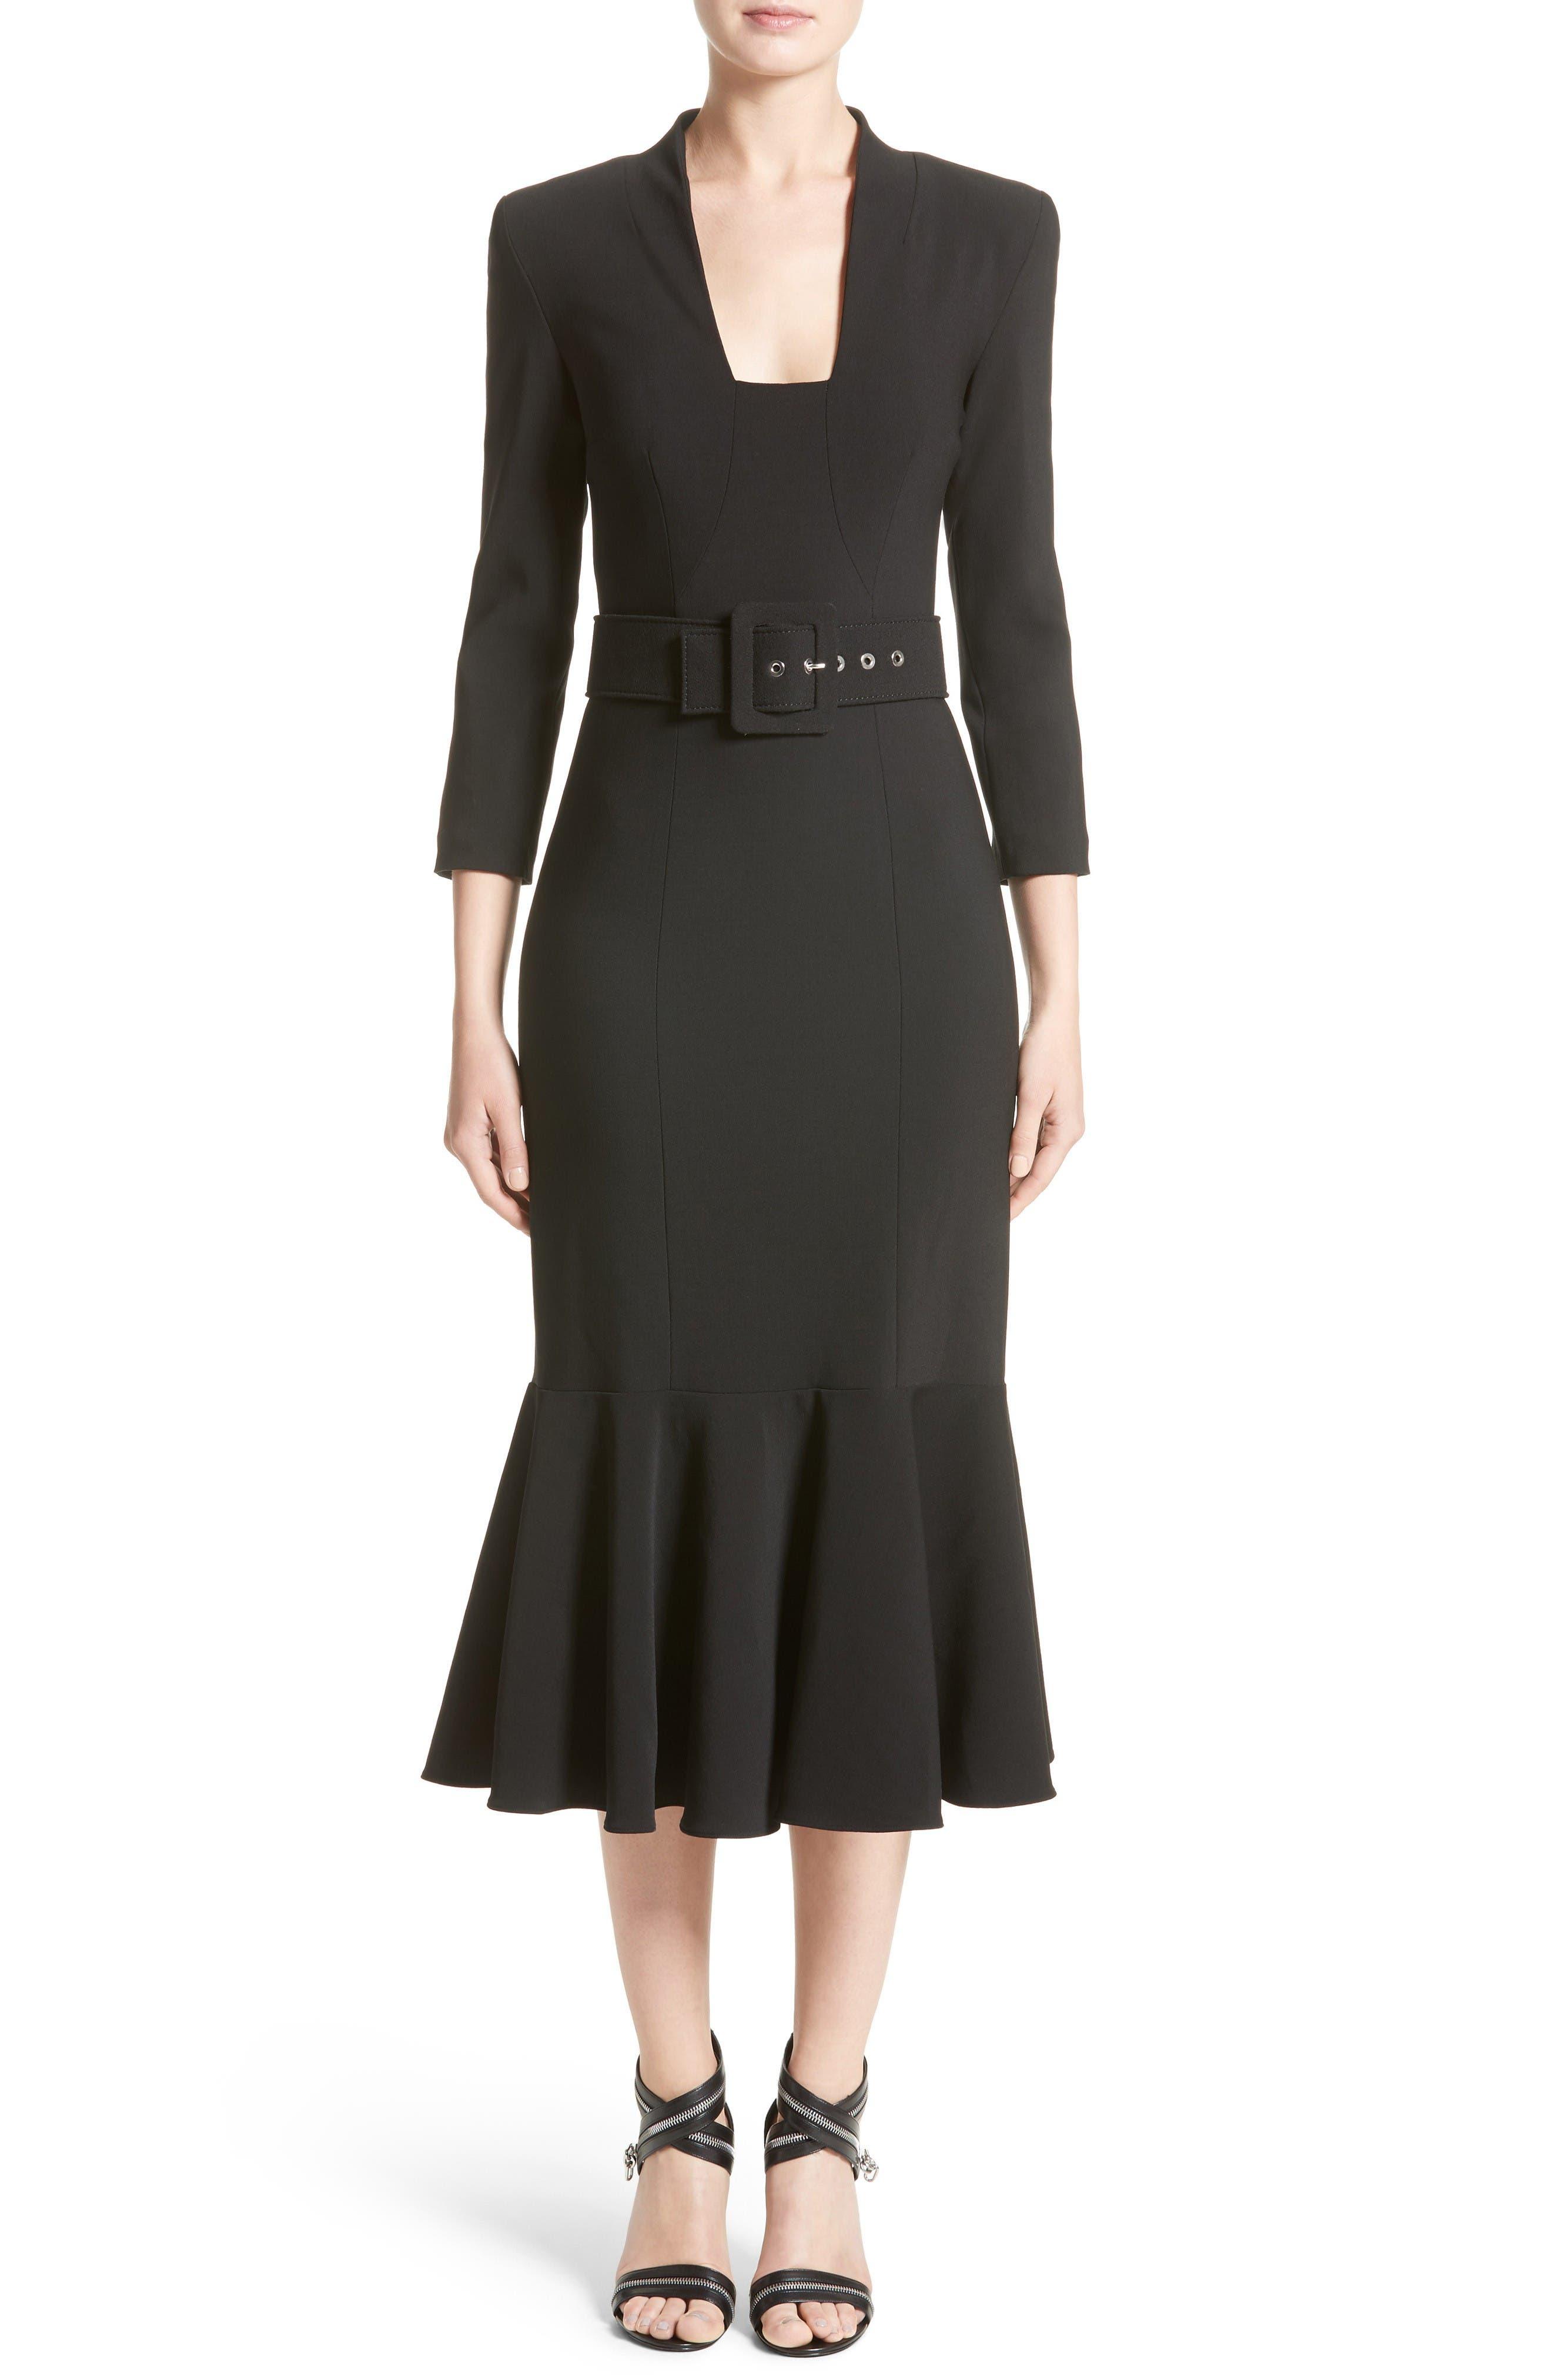 Main Image - Michael Kors Stretch Pebble Crepe Bolero Sheath Dress